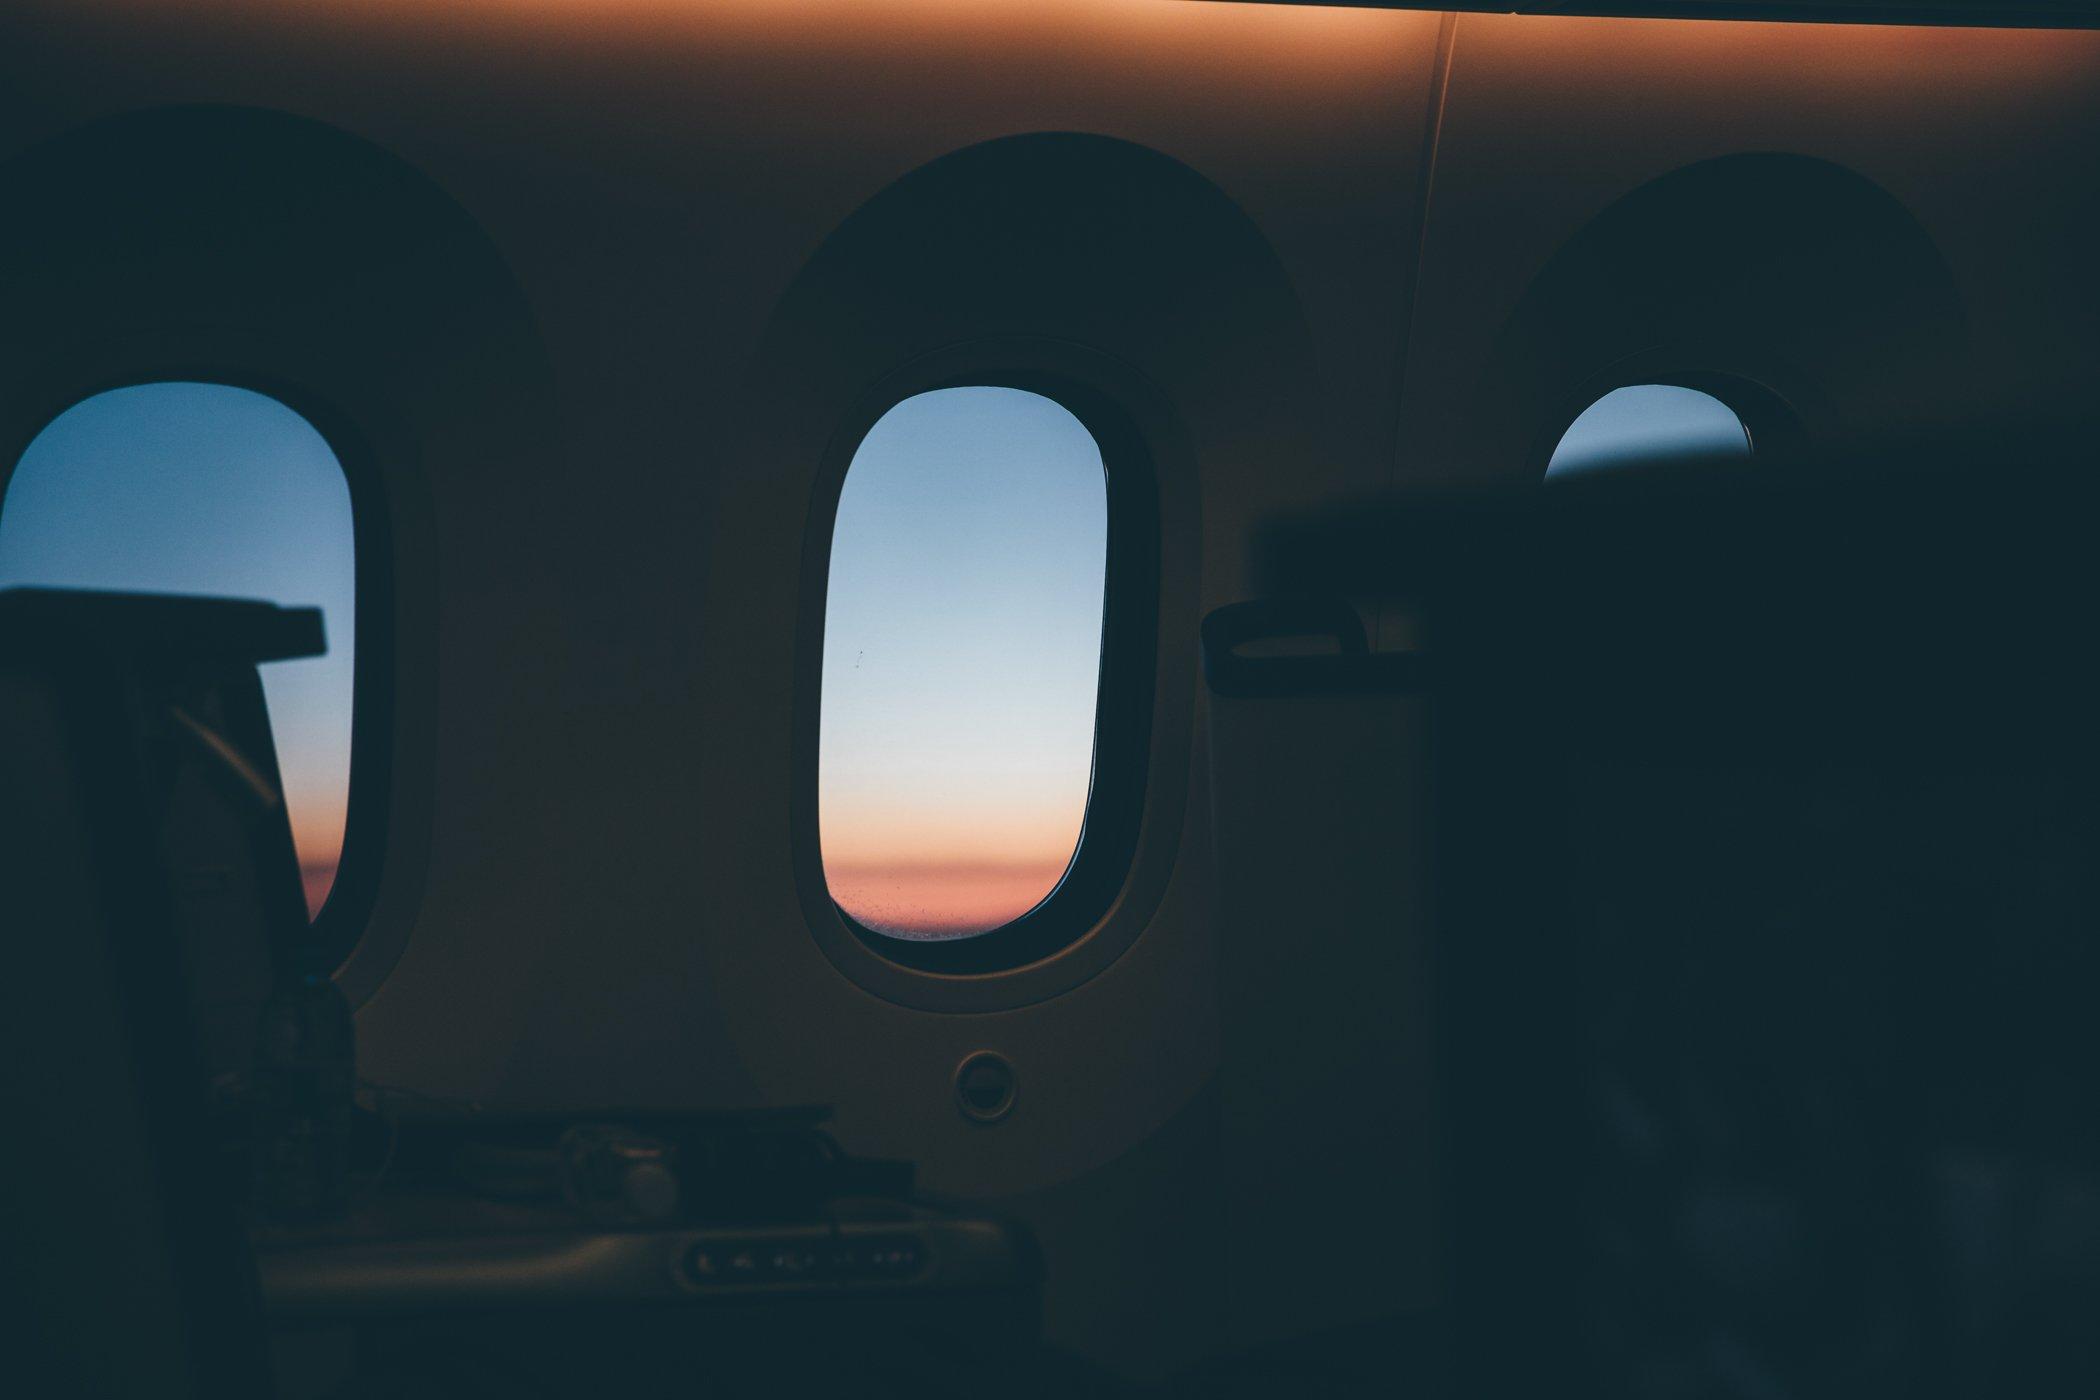 ANA Dreamliner flight from Vienna to Tokyo